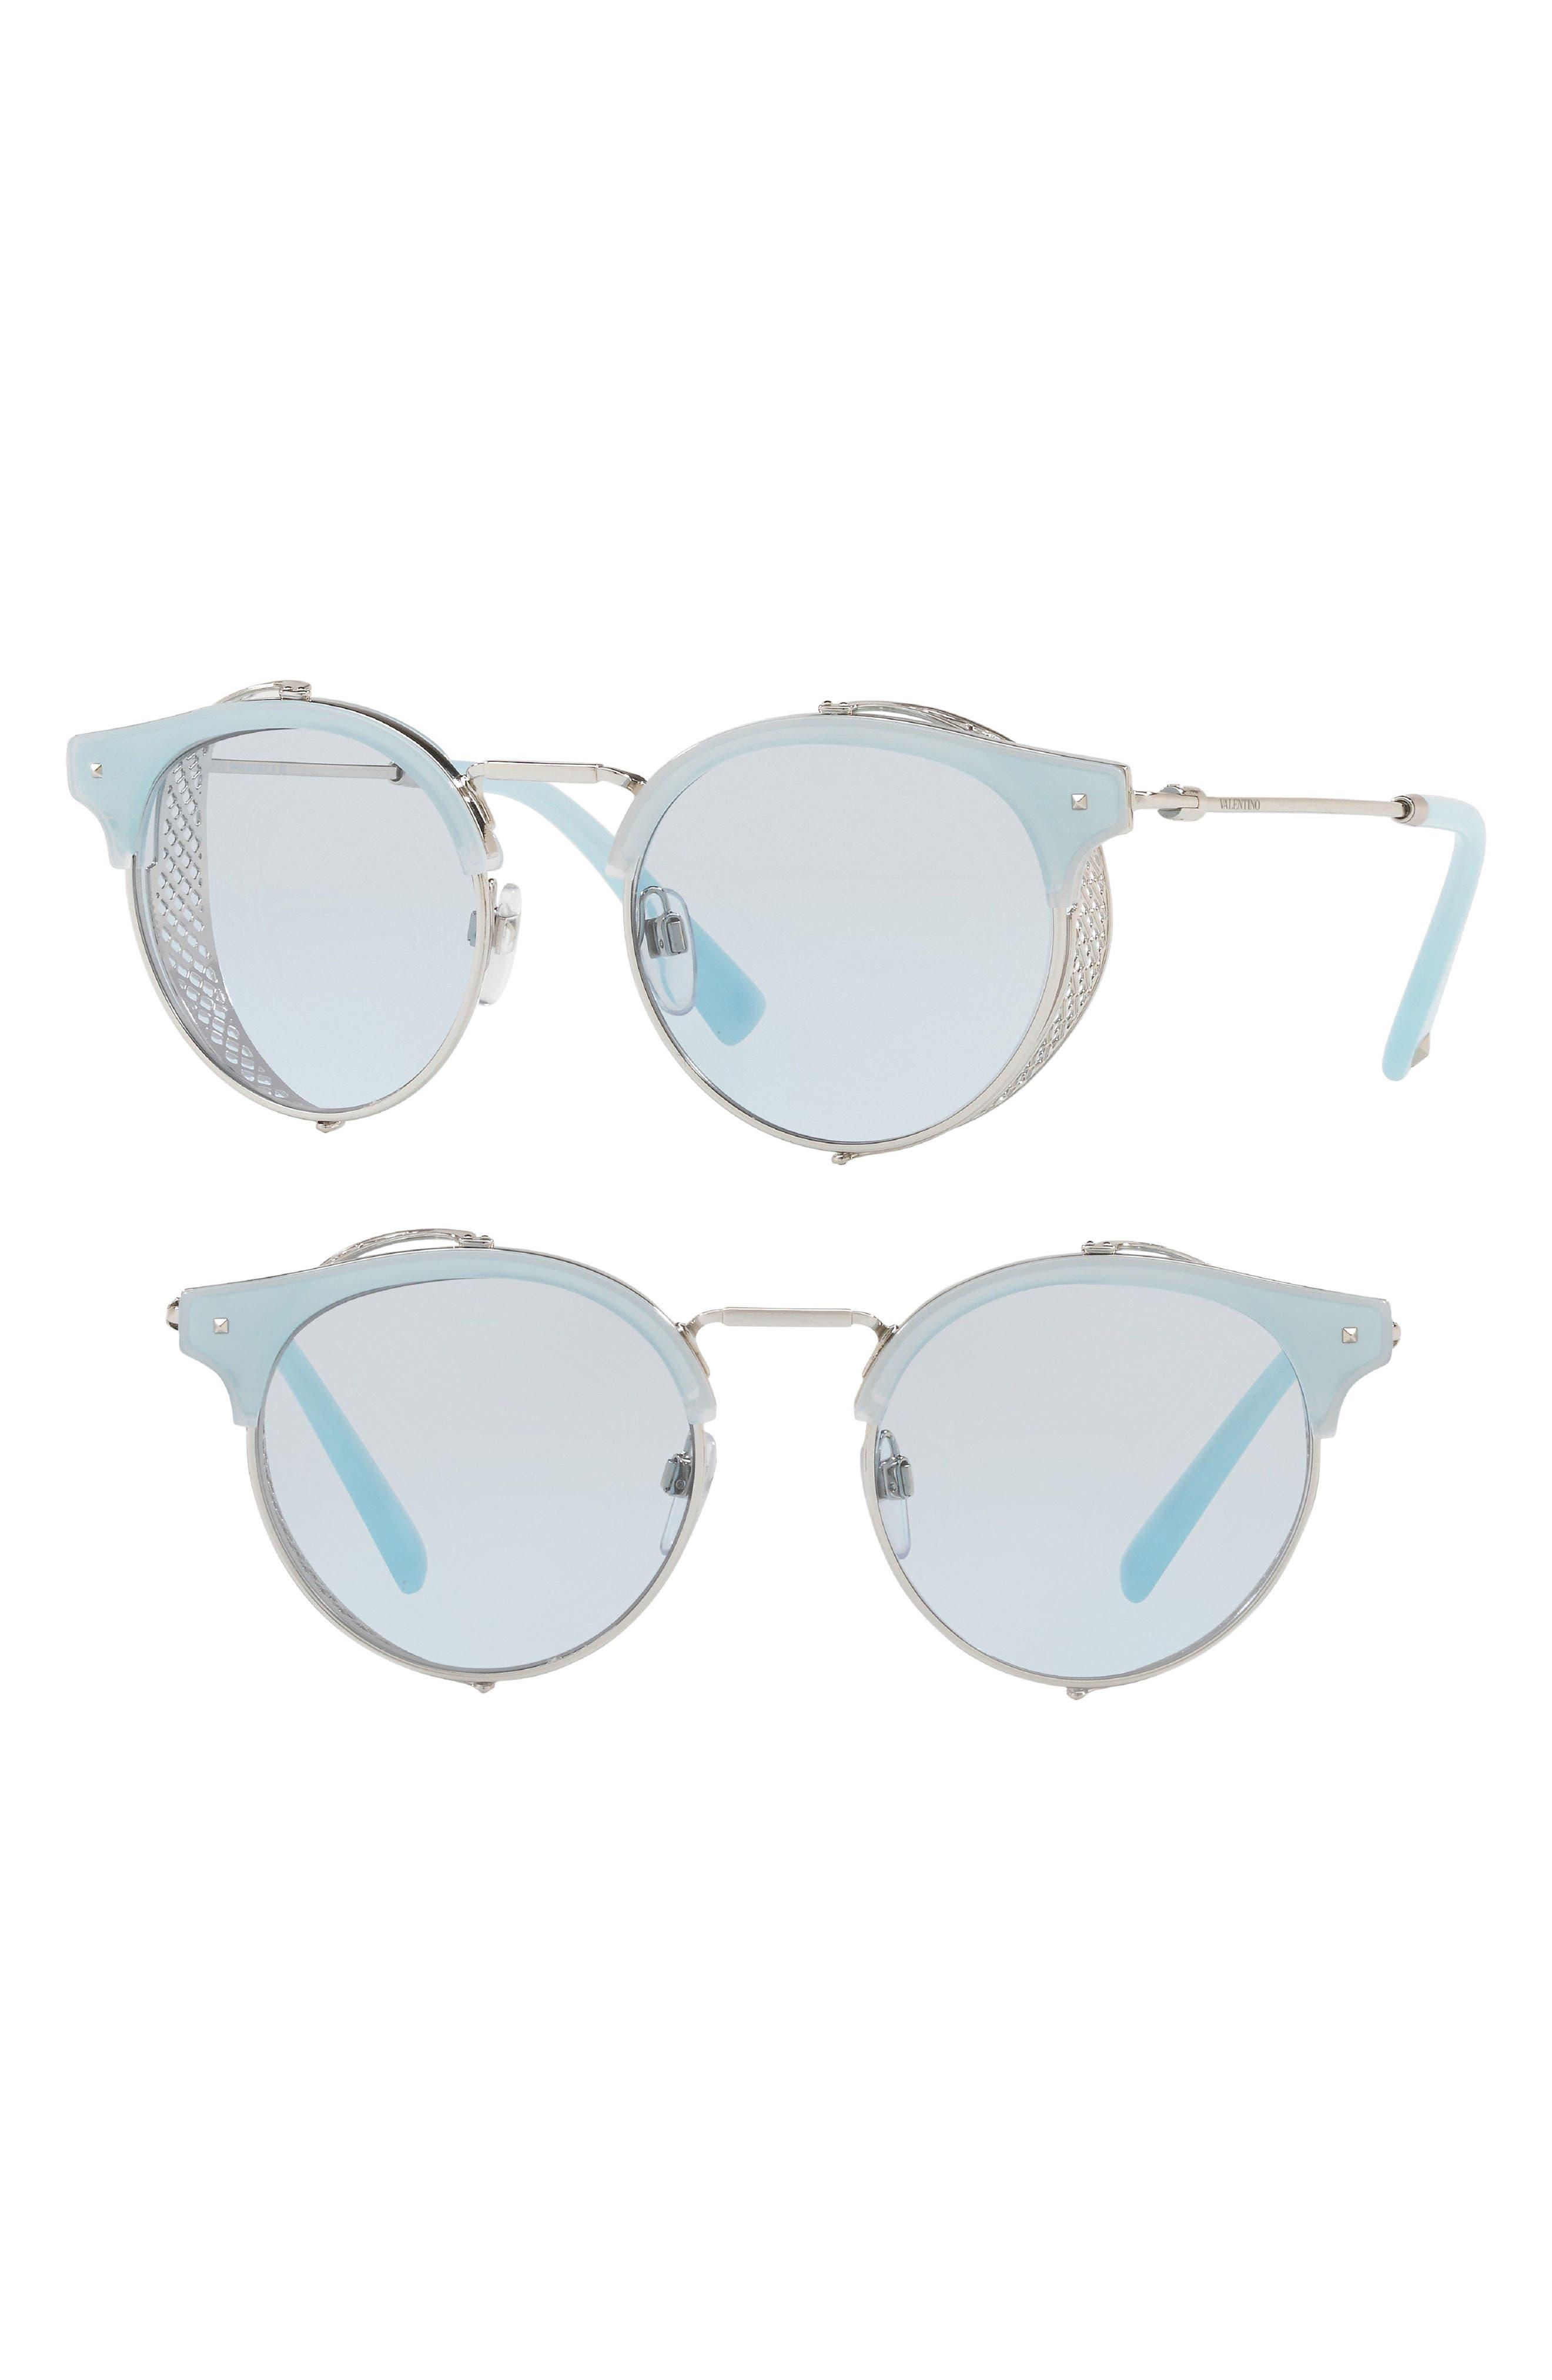 51mm Round Sunglasses,                         Main,                         color, 001